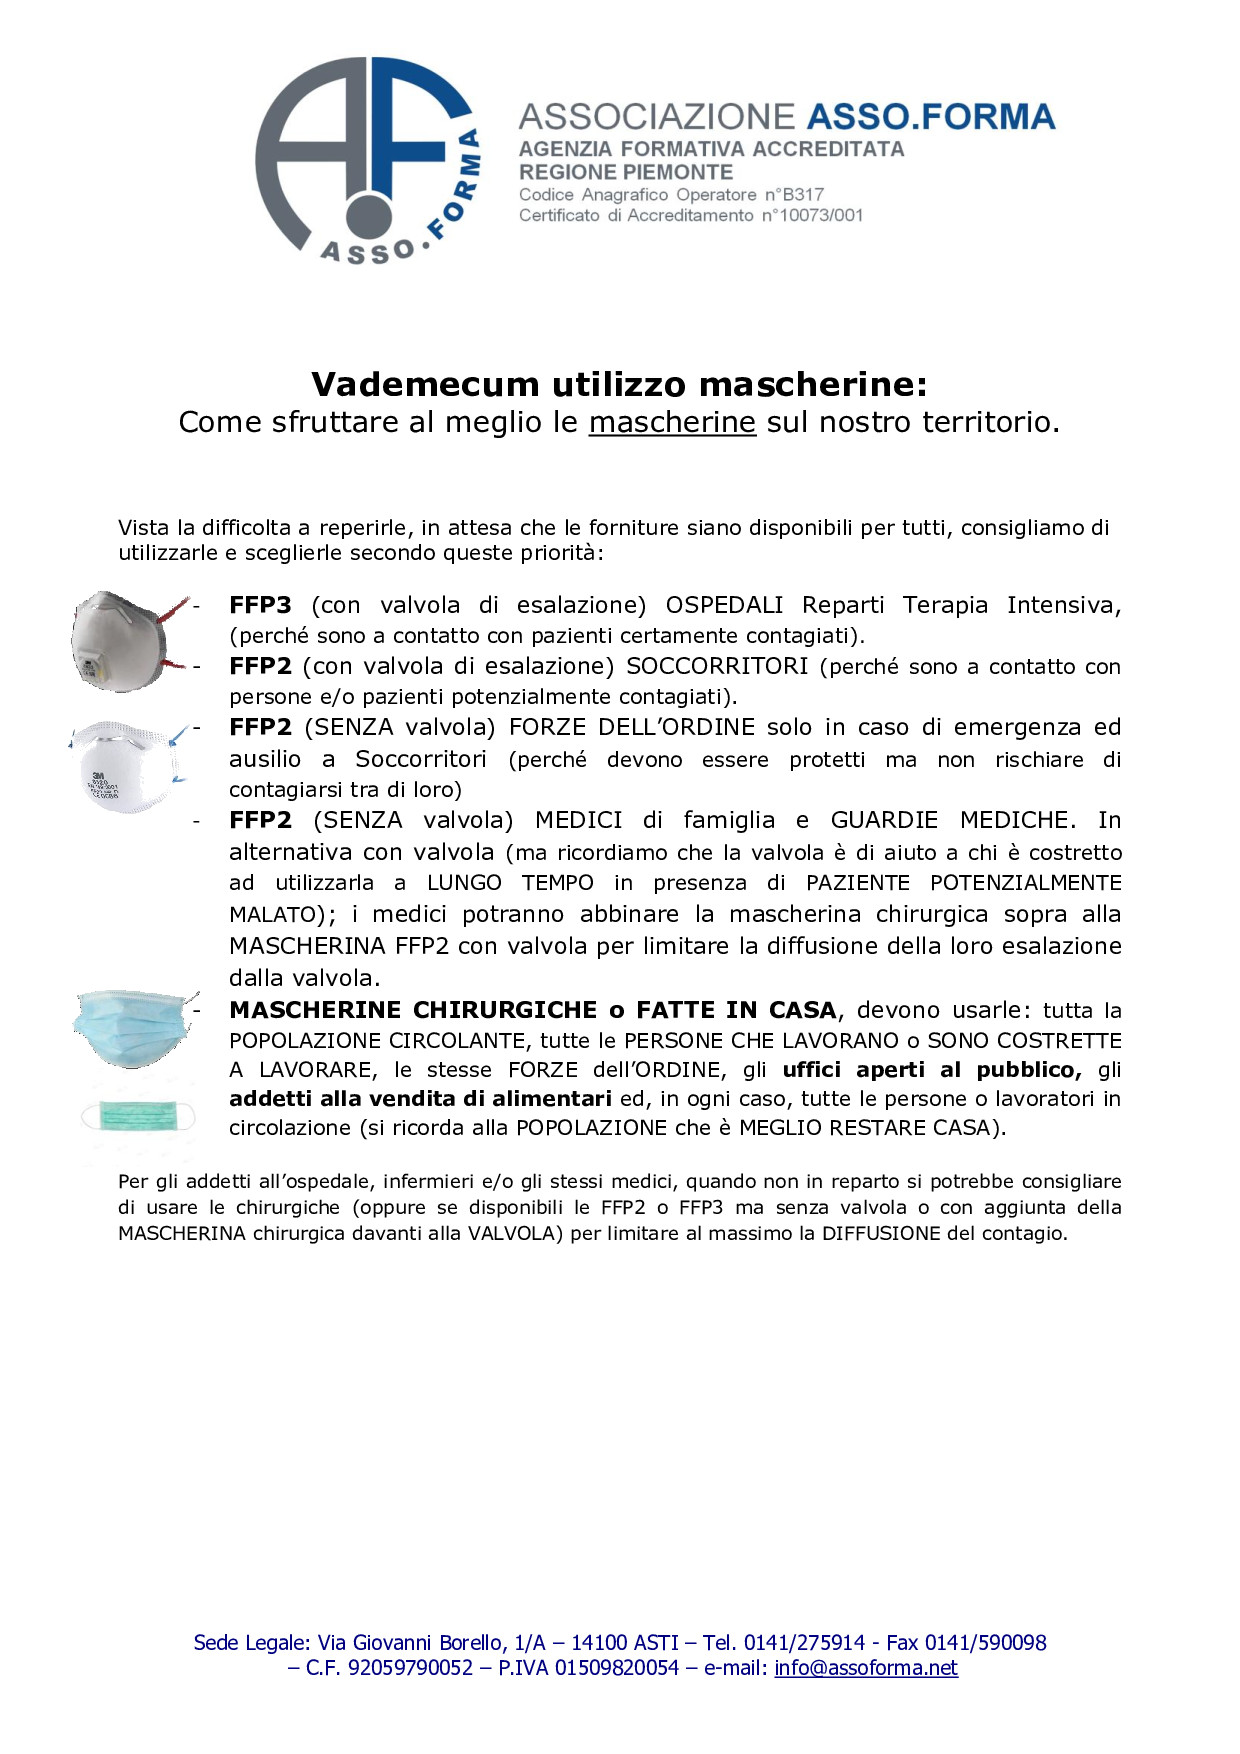 VADEMECUM Utilizzo Mascherine